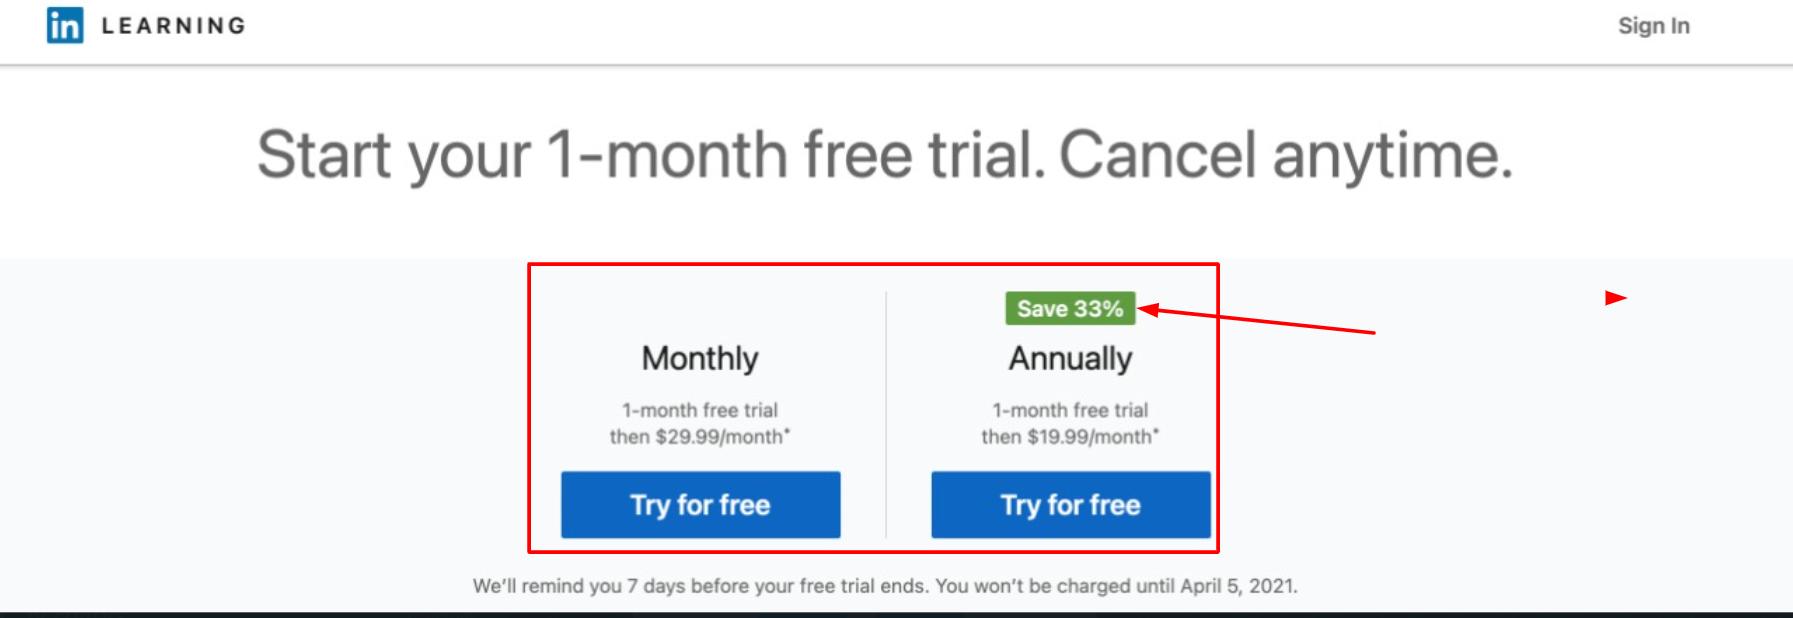 LinkedIn - Pricing